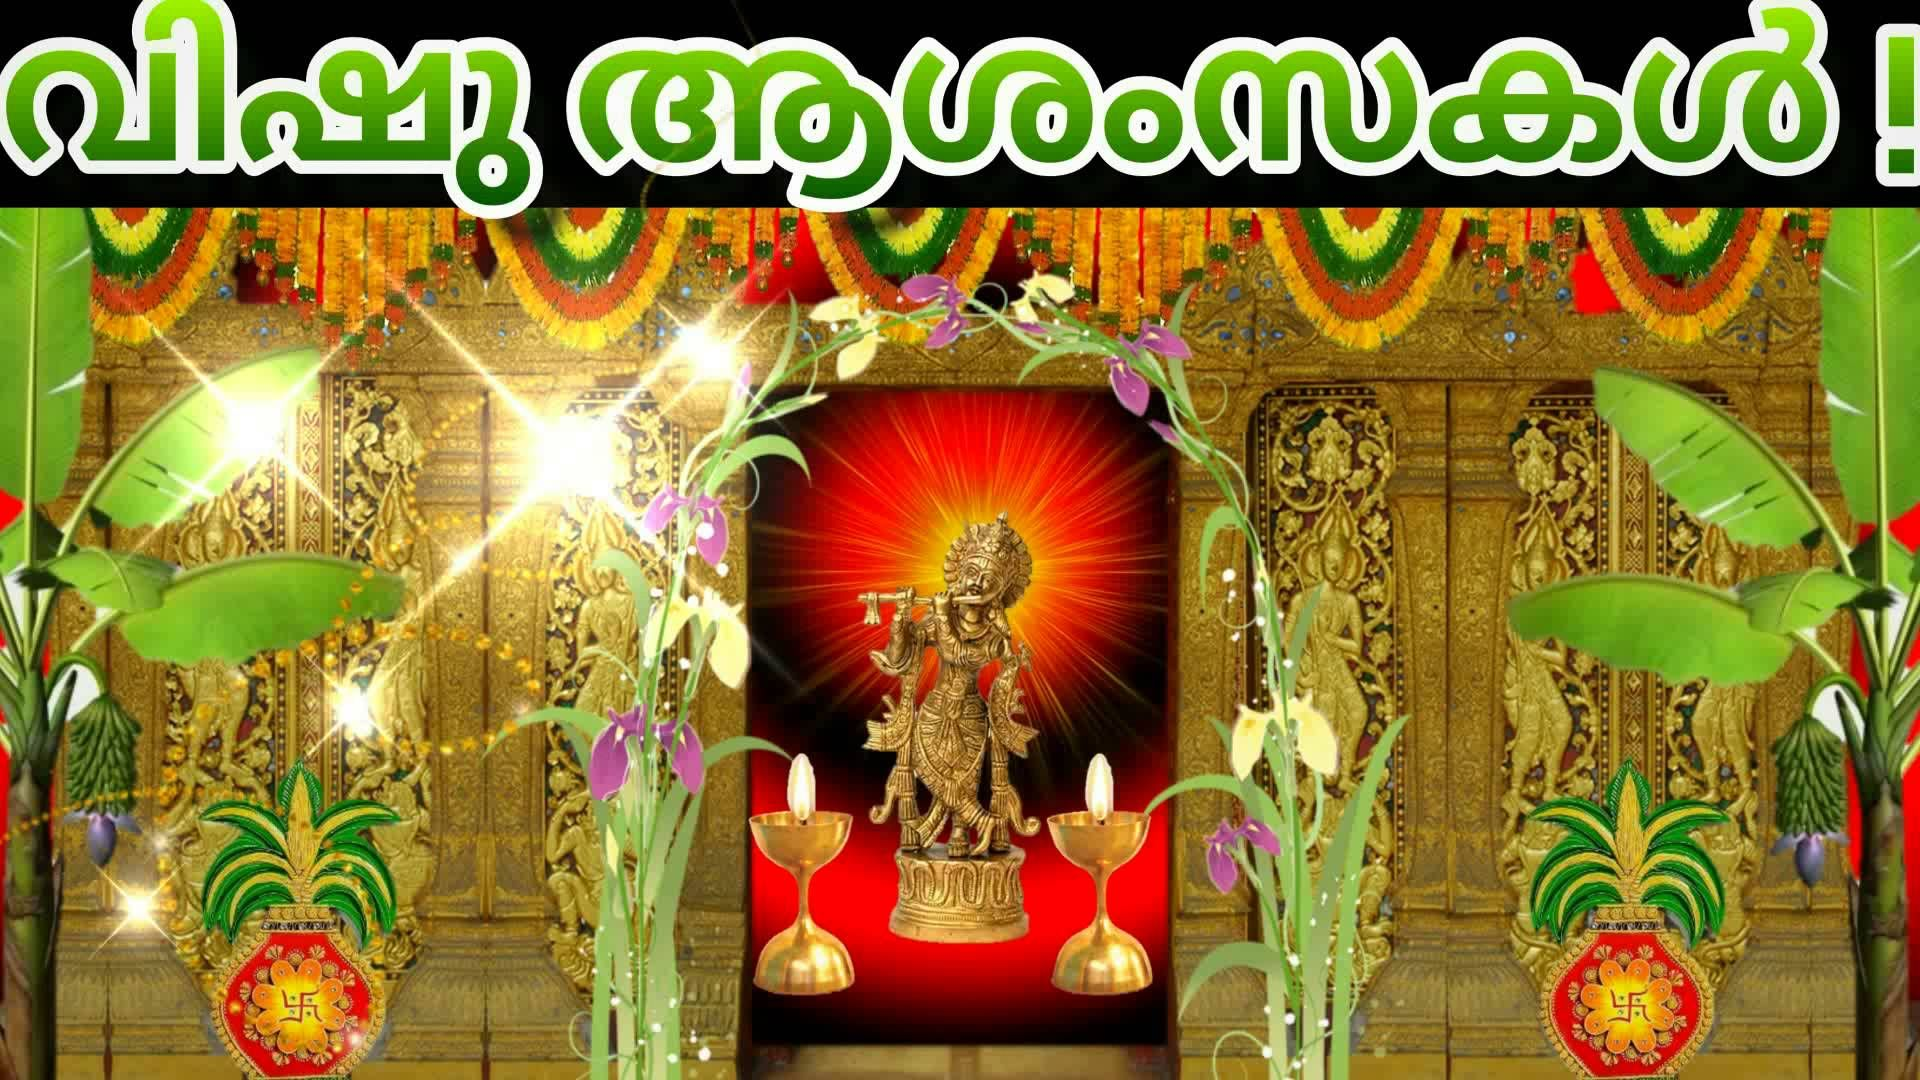 Happy Vishu Greetings In Malayalam Language Happy Vishu Greetings